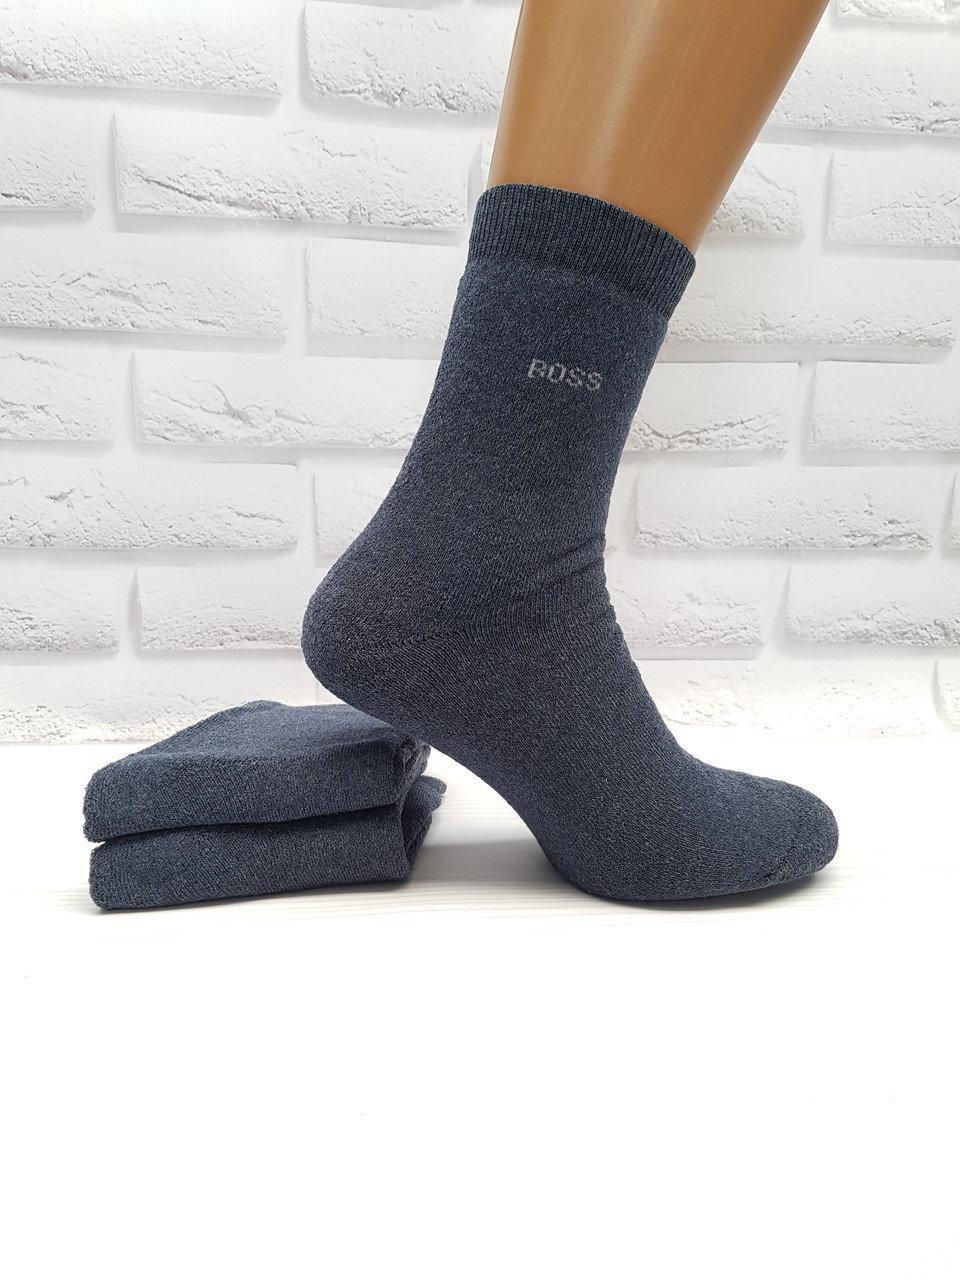 Носки махровые мужские джинс Добра Пара 1 пару 29-31 размер